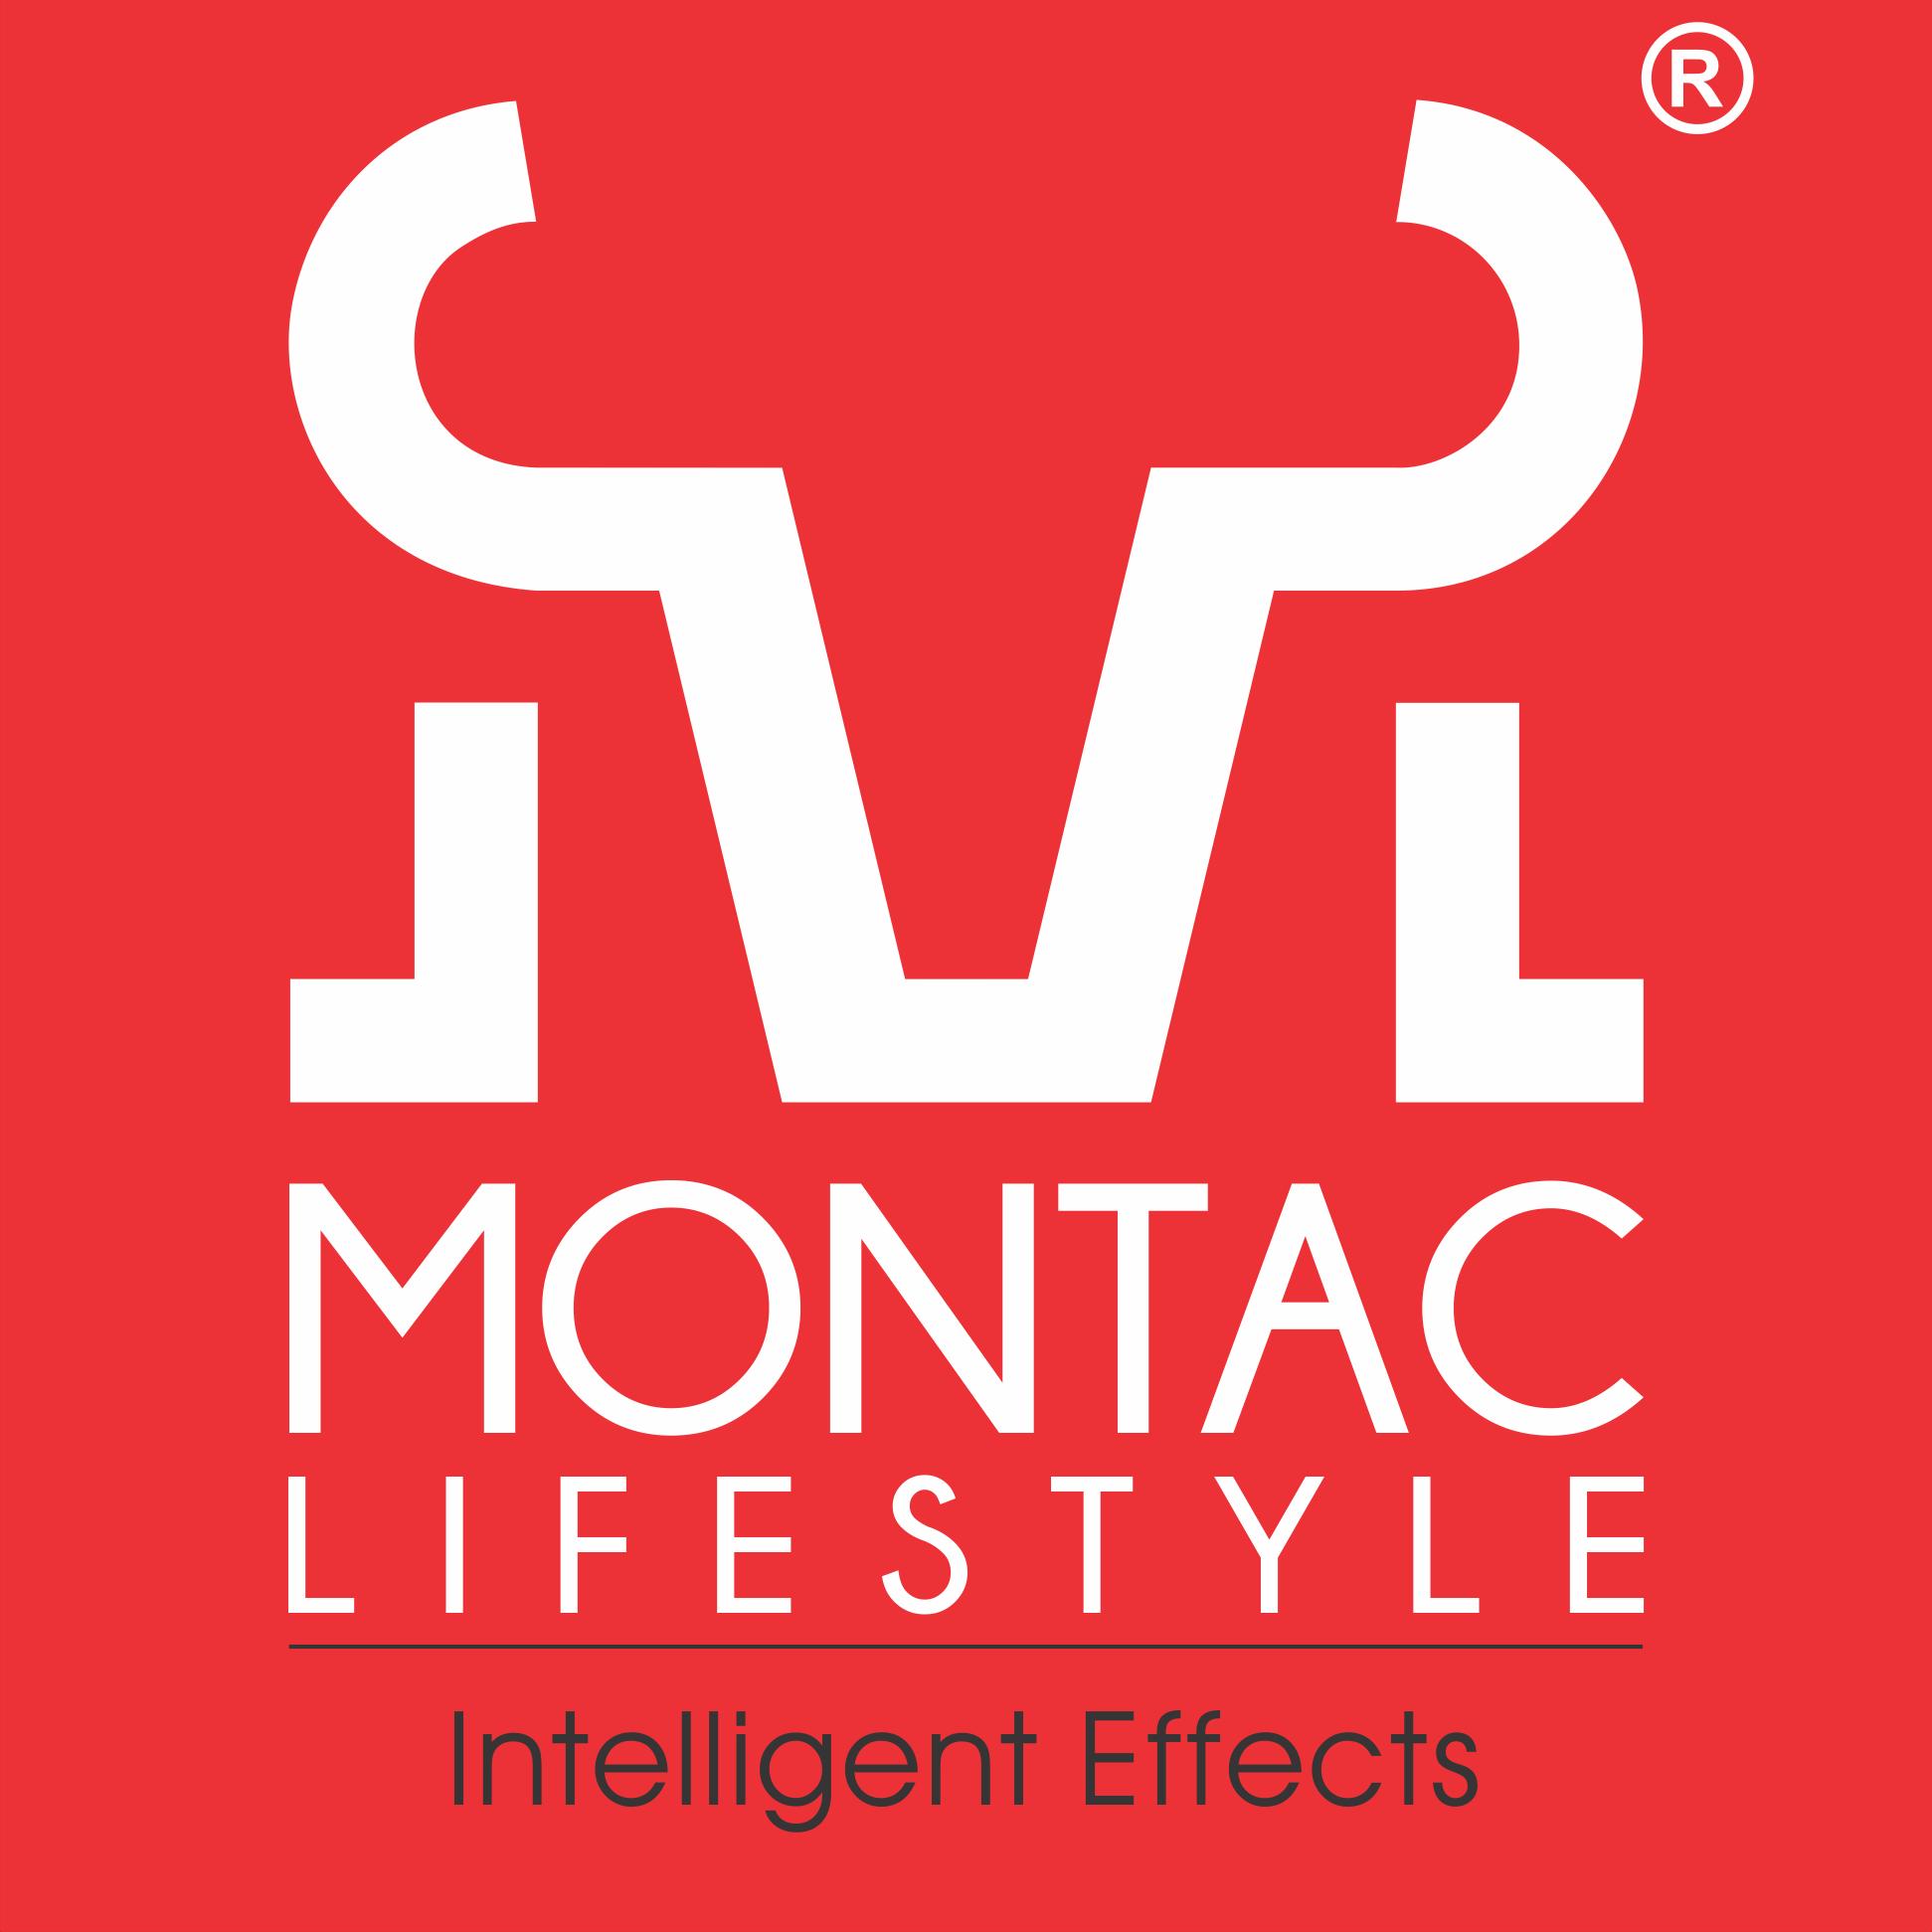 Montac Lifestyle